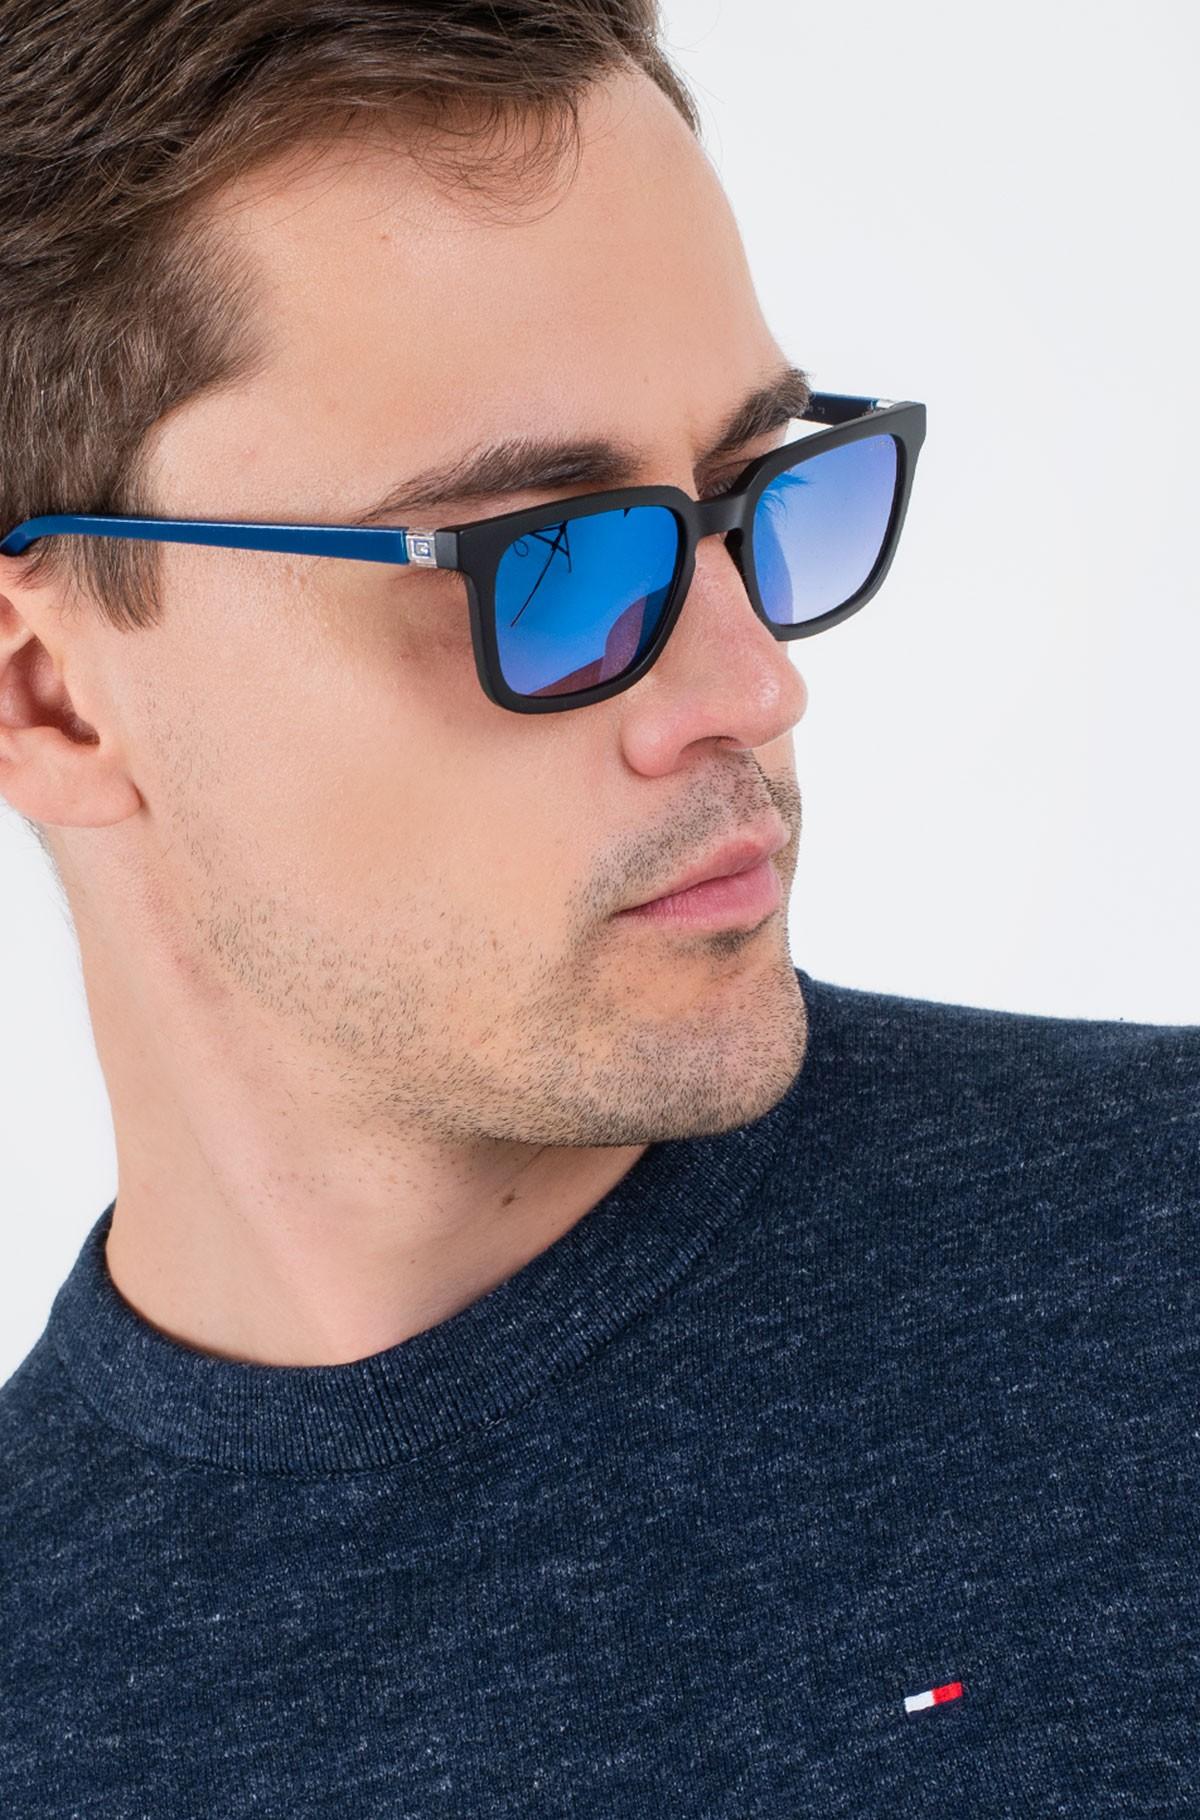 Sunglasses 6933-full-1